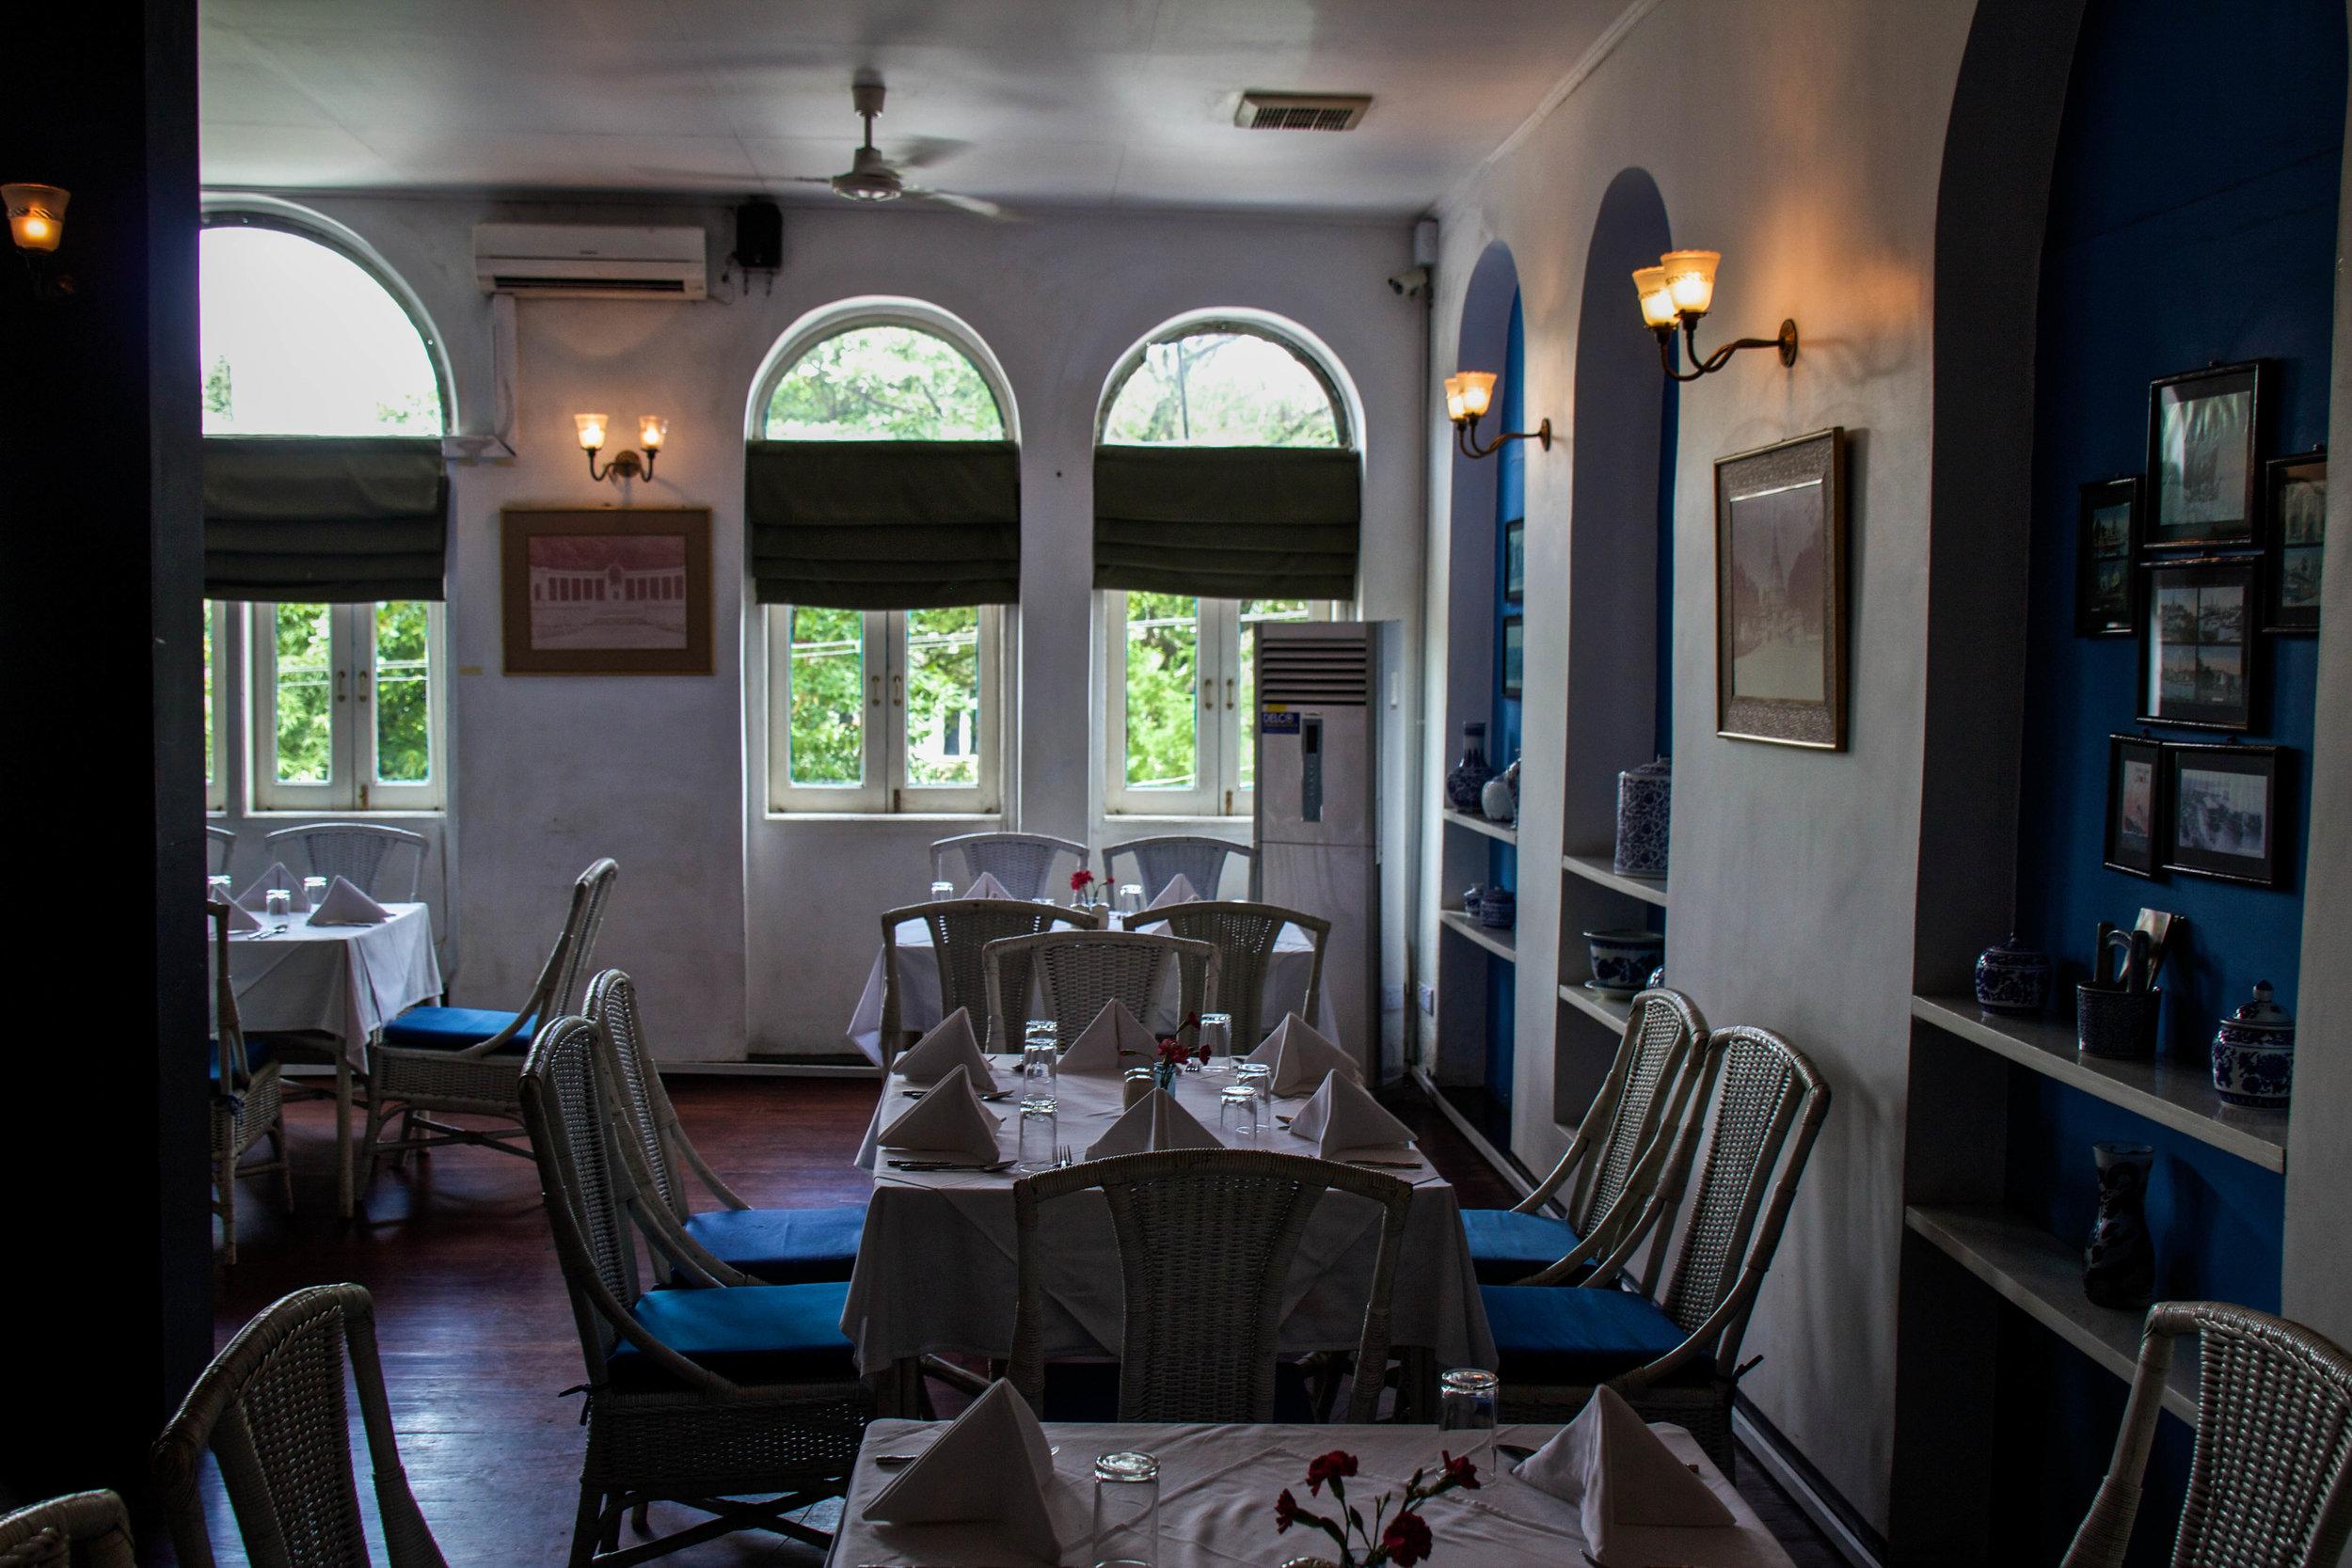 monsoon restaurant rangoon yangon burma myanmar 3-2.jpg